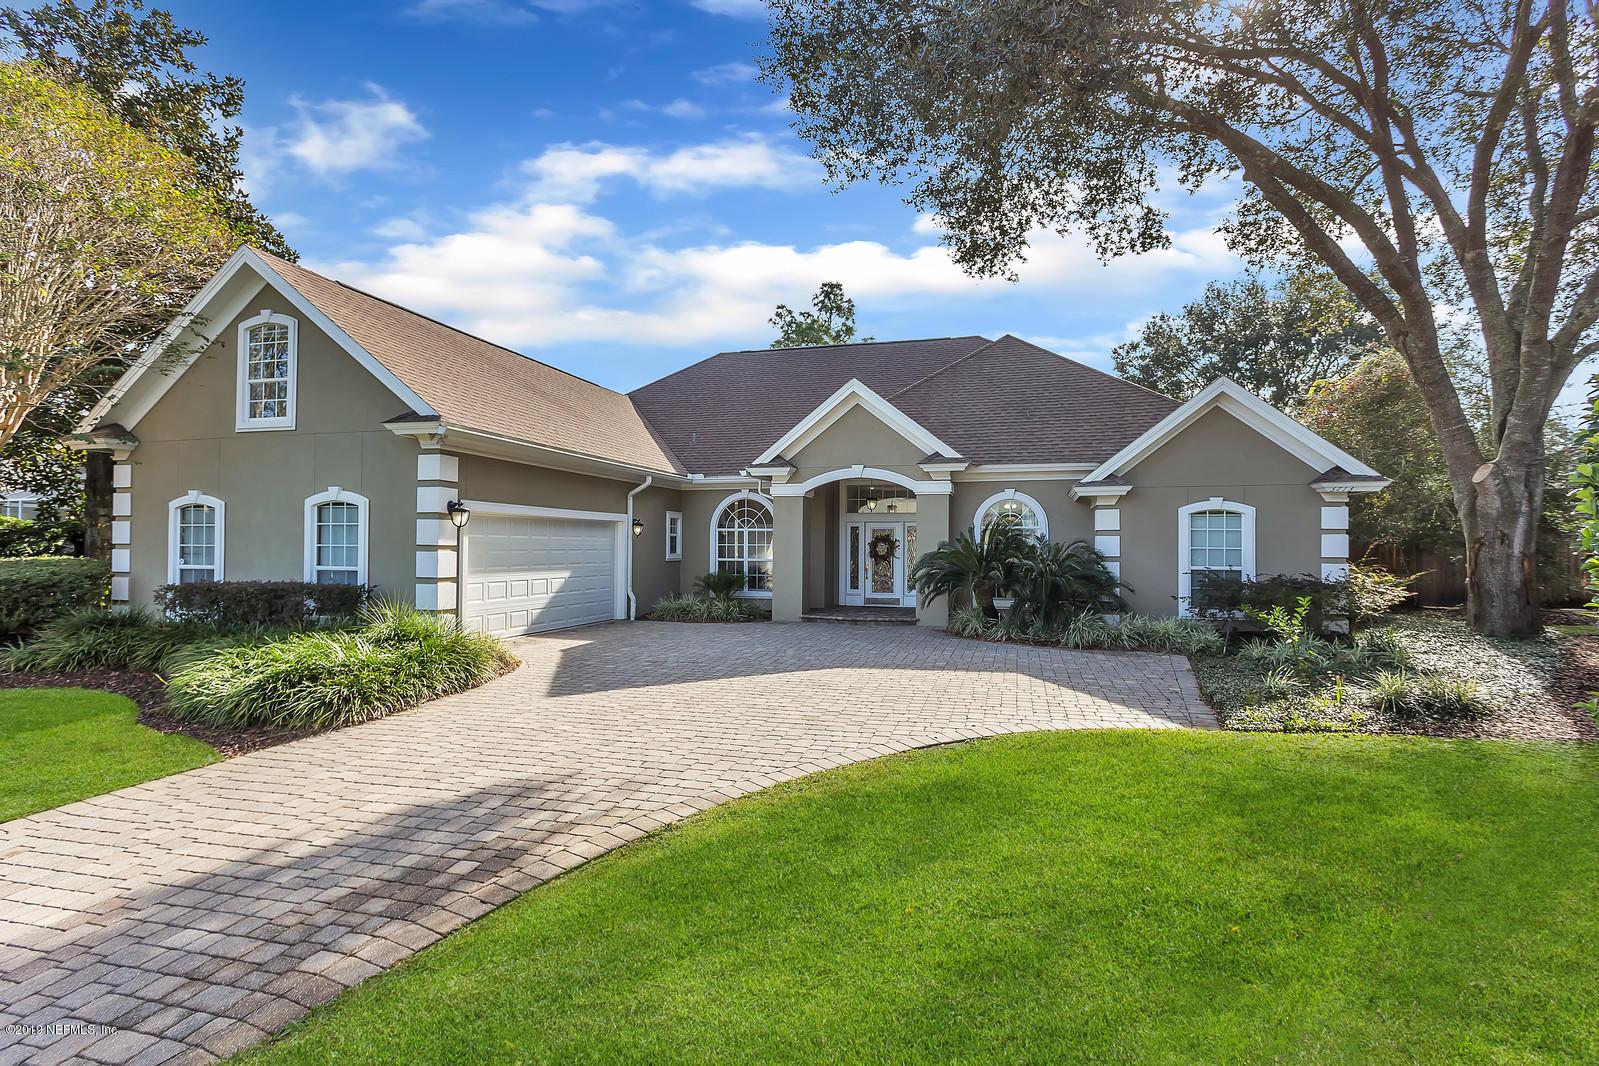 3713 Wicklow Manor Ct Jacksonville, Fl 32224